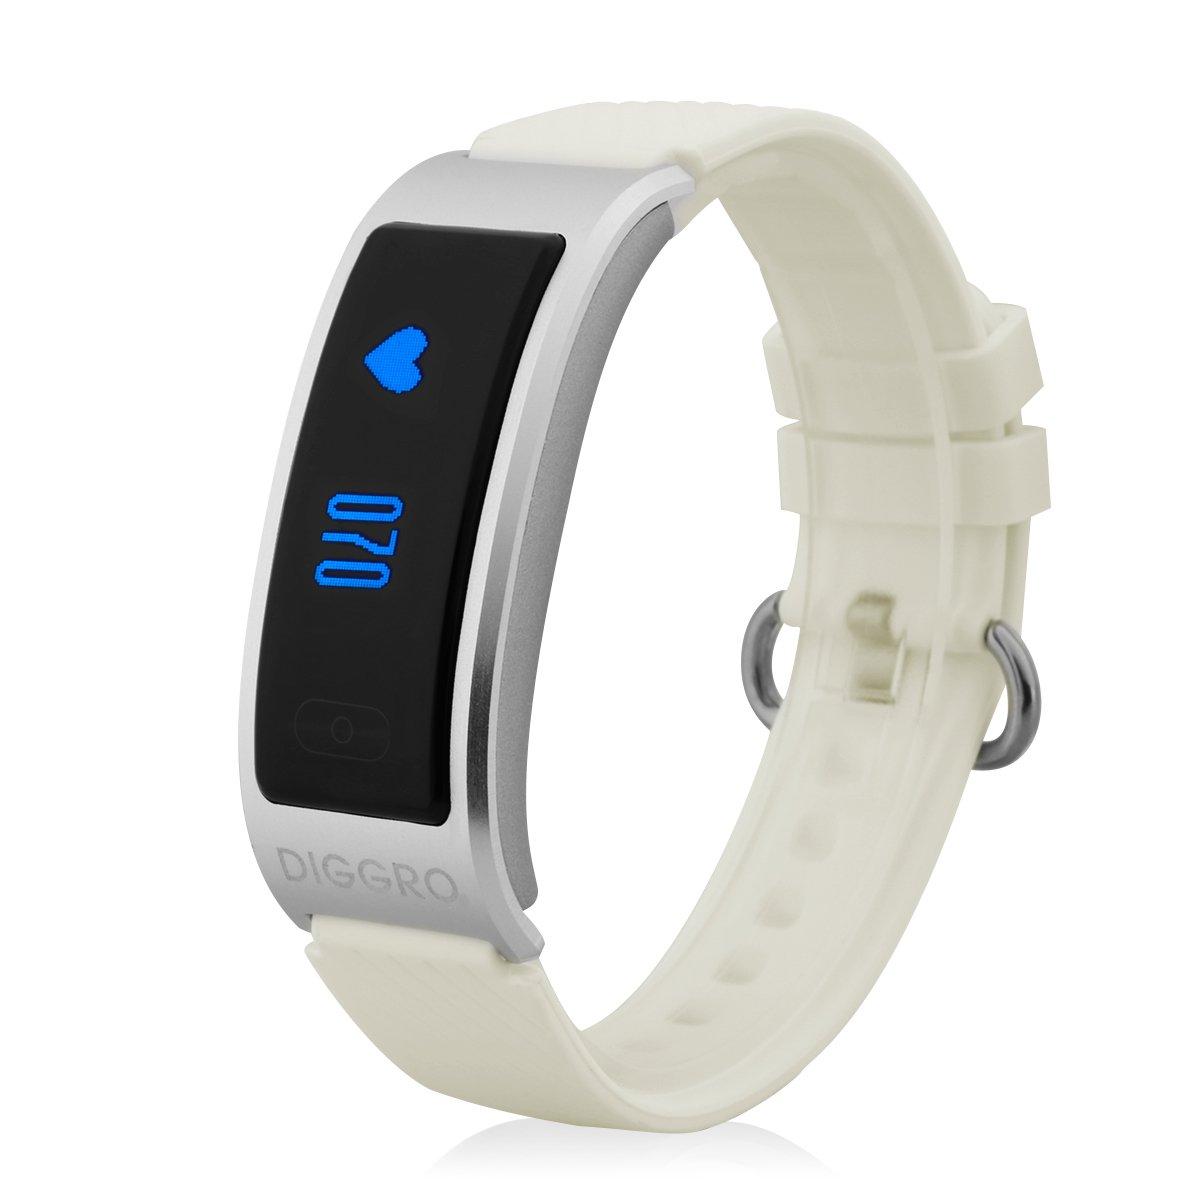 Diggro DF23 - Smartwatch Pulsera Inteligente para Móvil ...